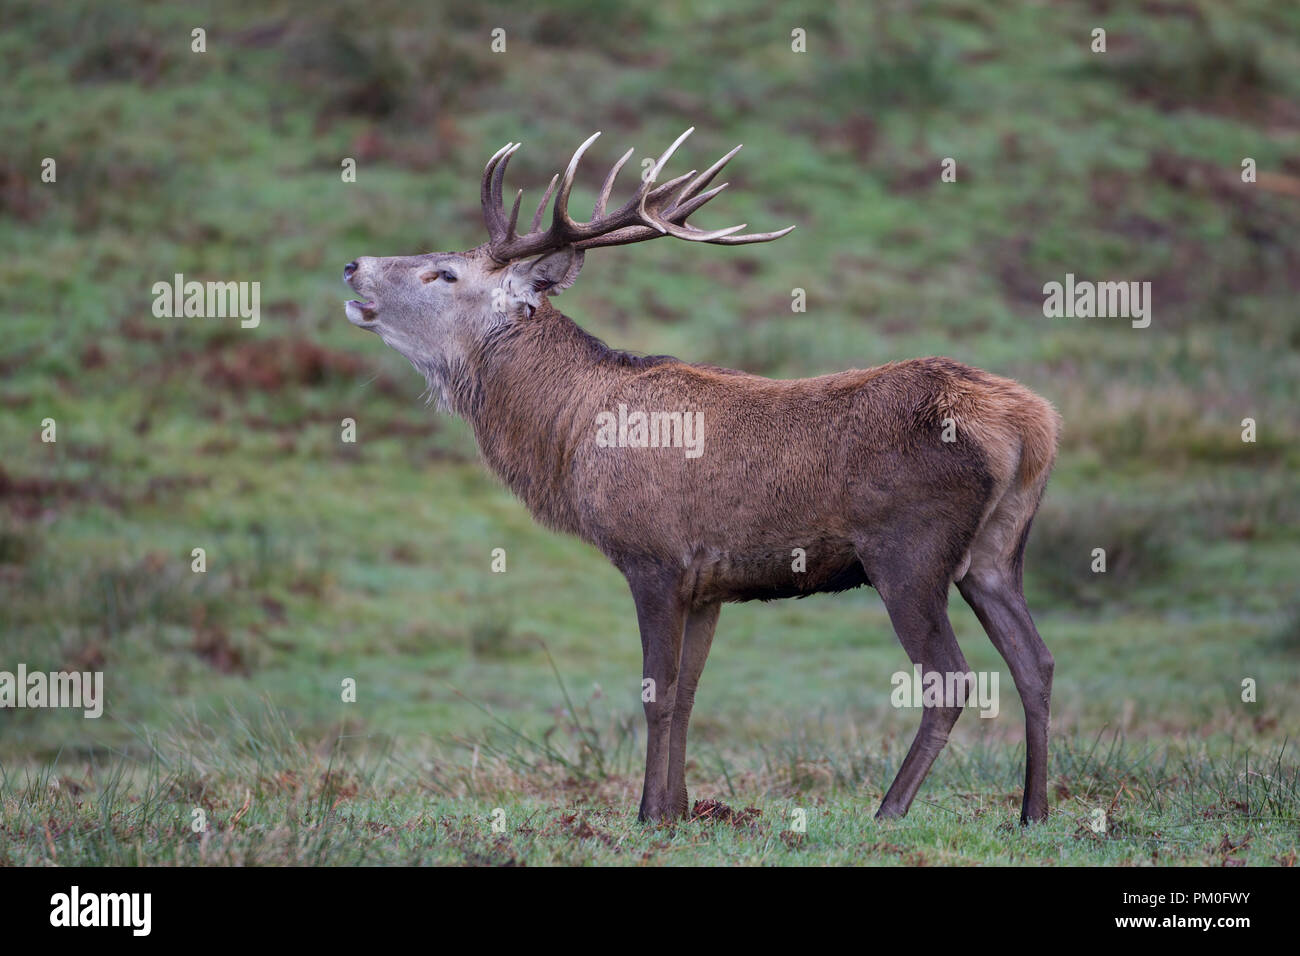 Maschio rosso cervo Cervus elaphus con magnifici palchi chiamando in autunno Foto Stock